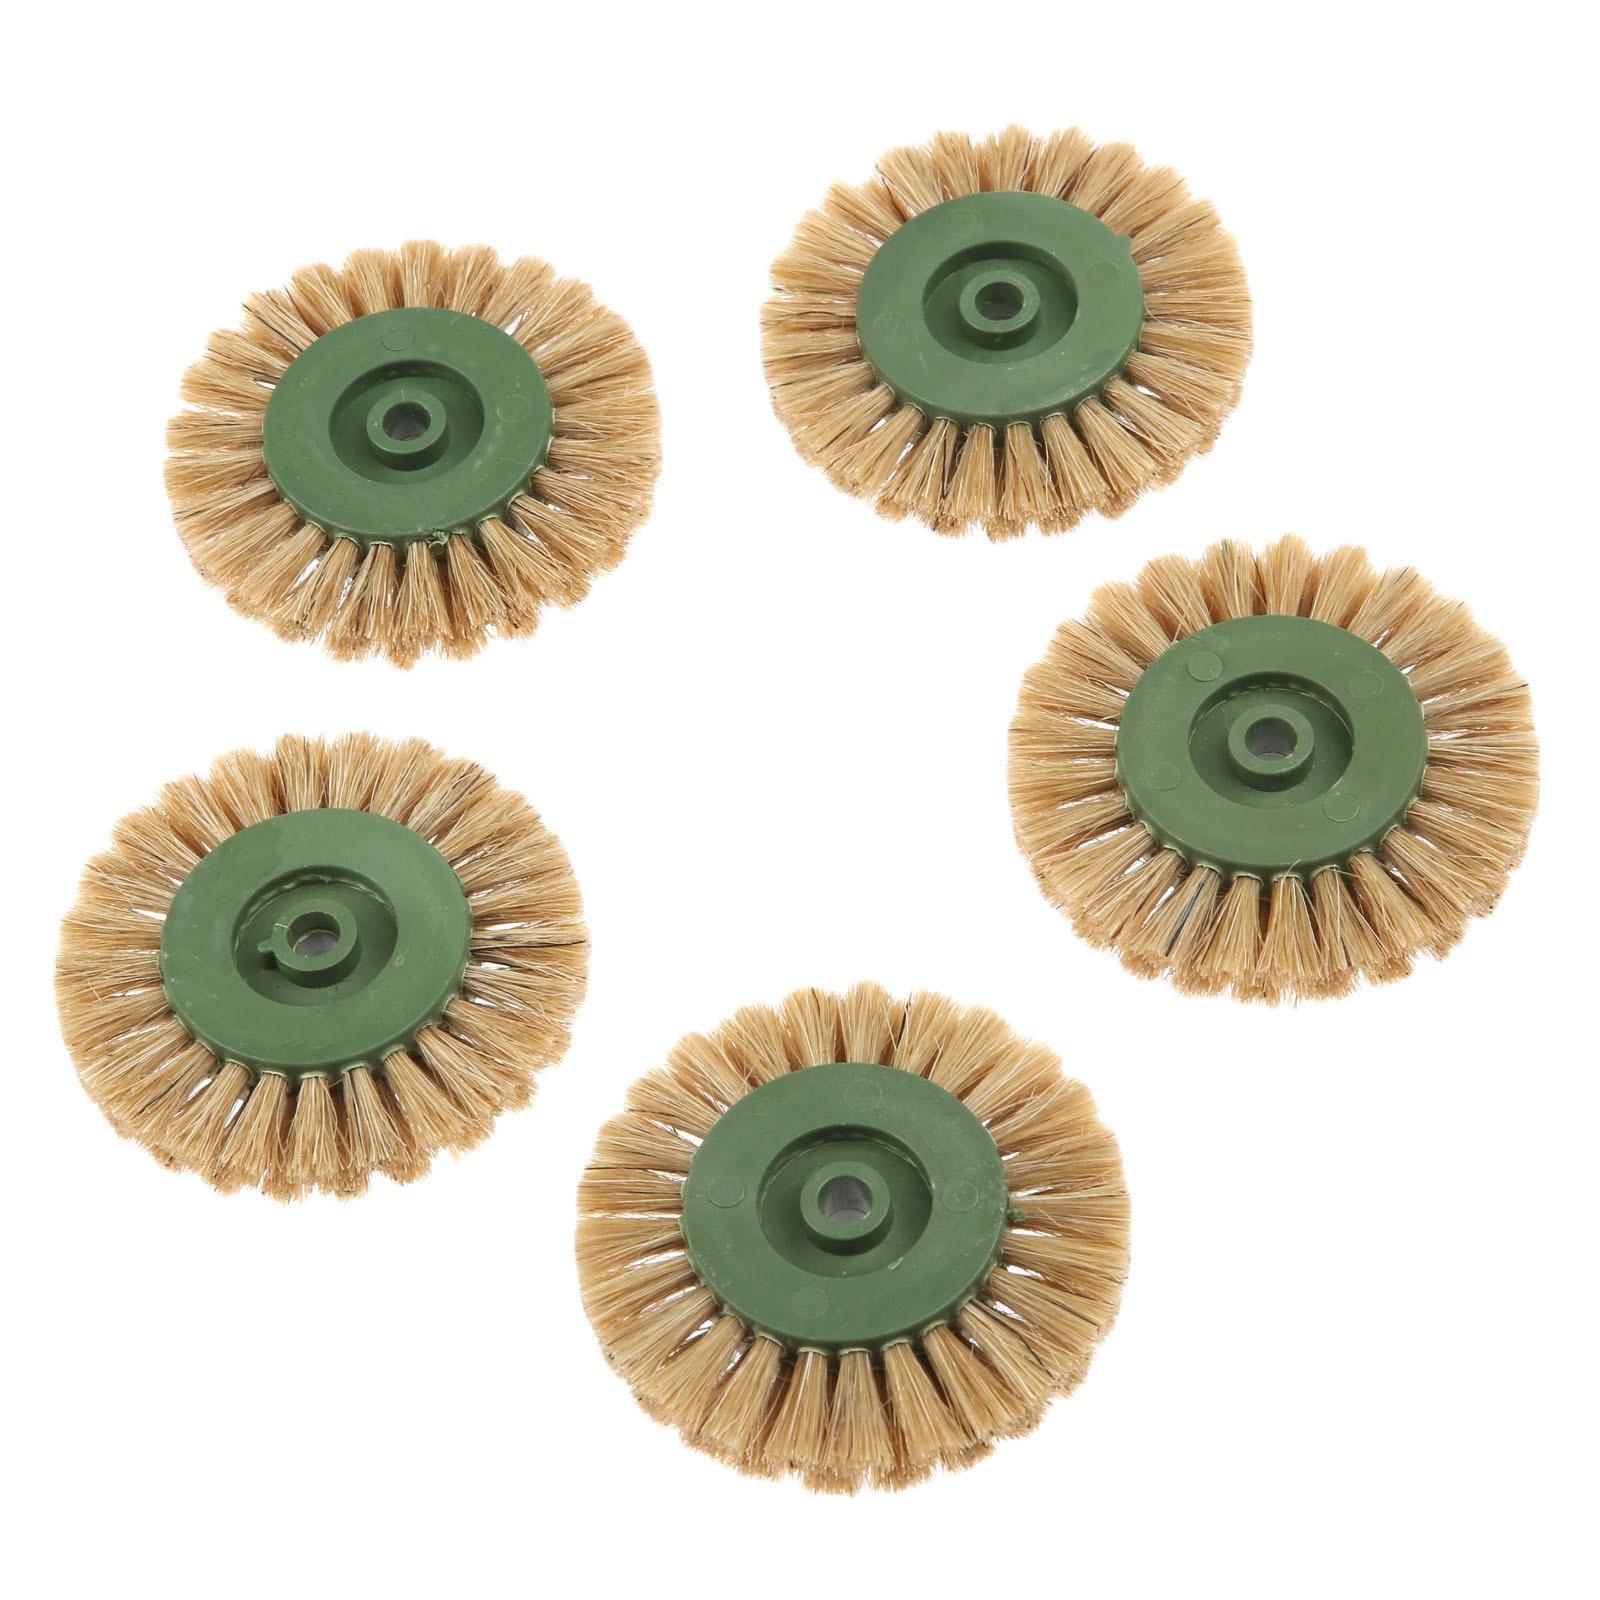 DRELD 5Pcs Dremel Accessories 60mm Grinding Brush Head Abrasive Wheel Yellow Buffing Polishing Wheels For Dremel Rotary Tool